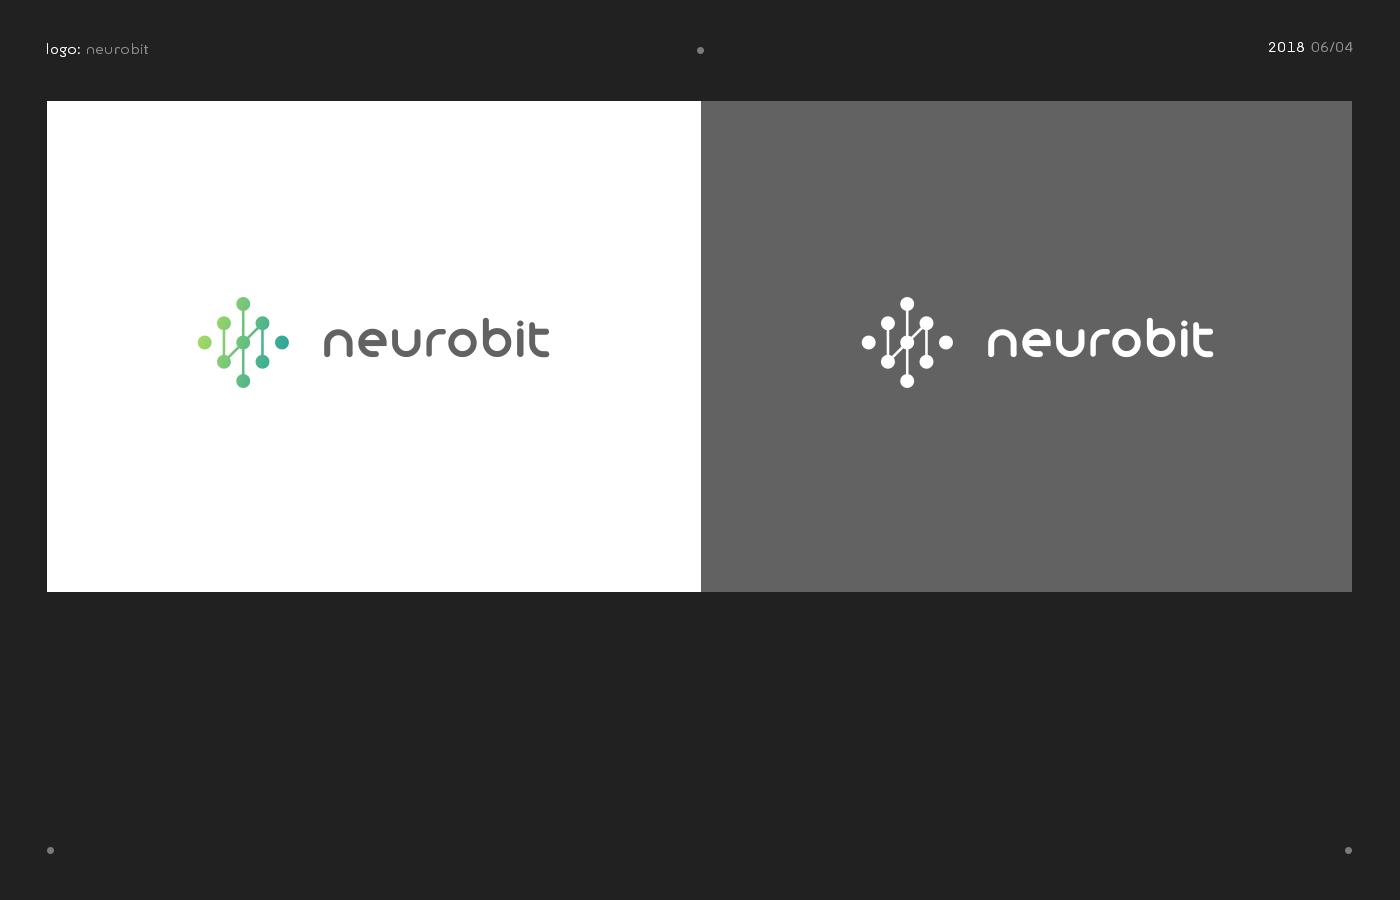 Neurobit